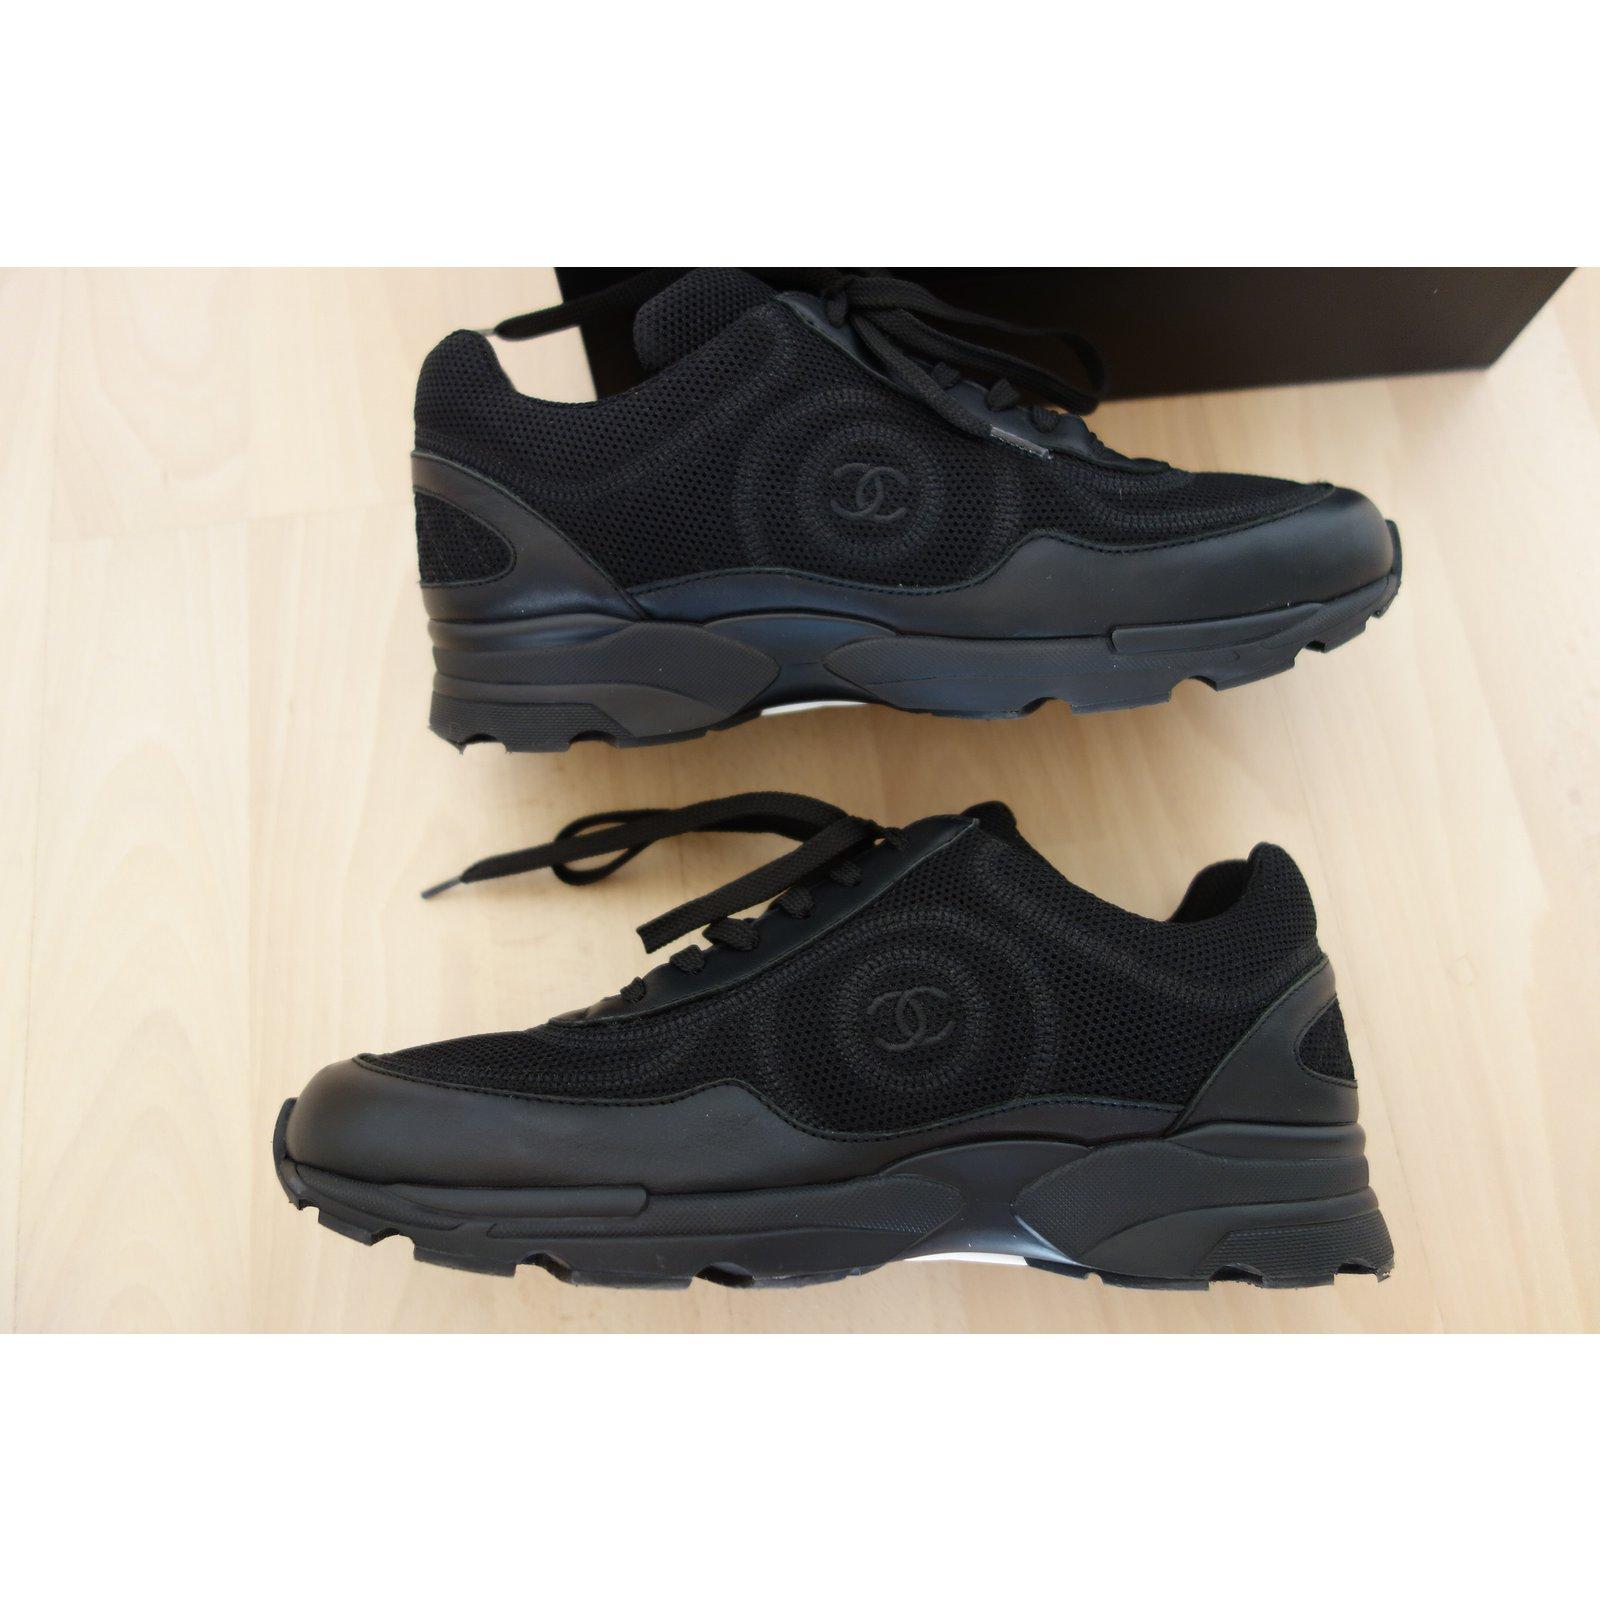 Baskets Chanel sneaker cuir et tissu CHANEL noir 39.5 Cuir Noir ref.21042 -  Joli Closet 555deda6a08